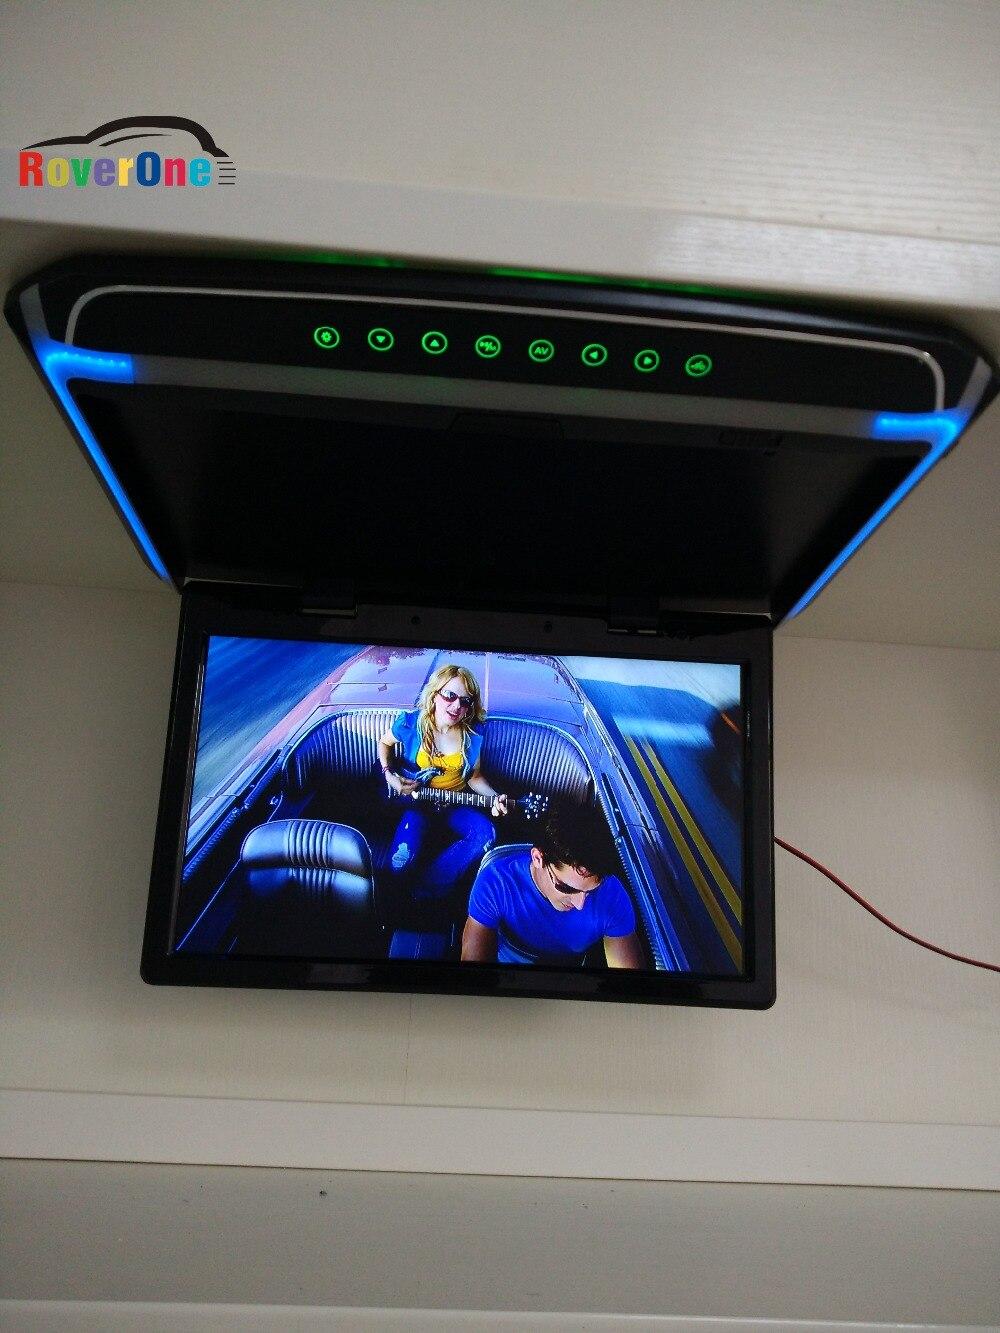 15.6'' Inch HD 1080P Automotivo Auto Mobile Car Flip Down Overhead Ceiling TFT LCD Monitor Coach Truck Bus AD Player HDMI USB SD